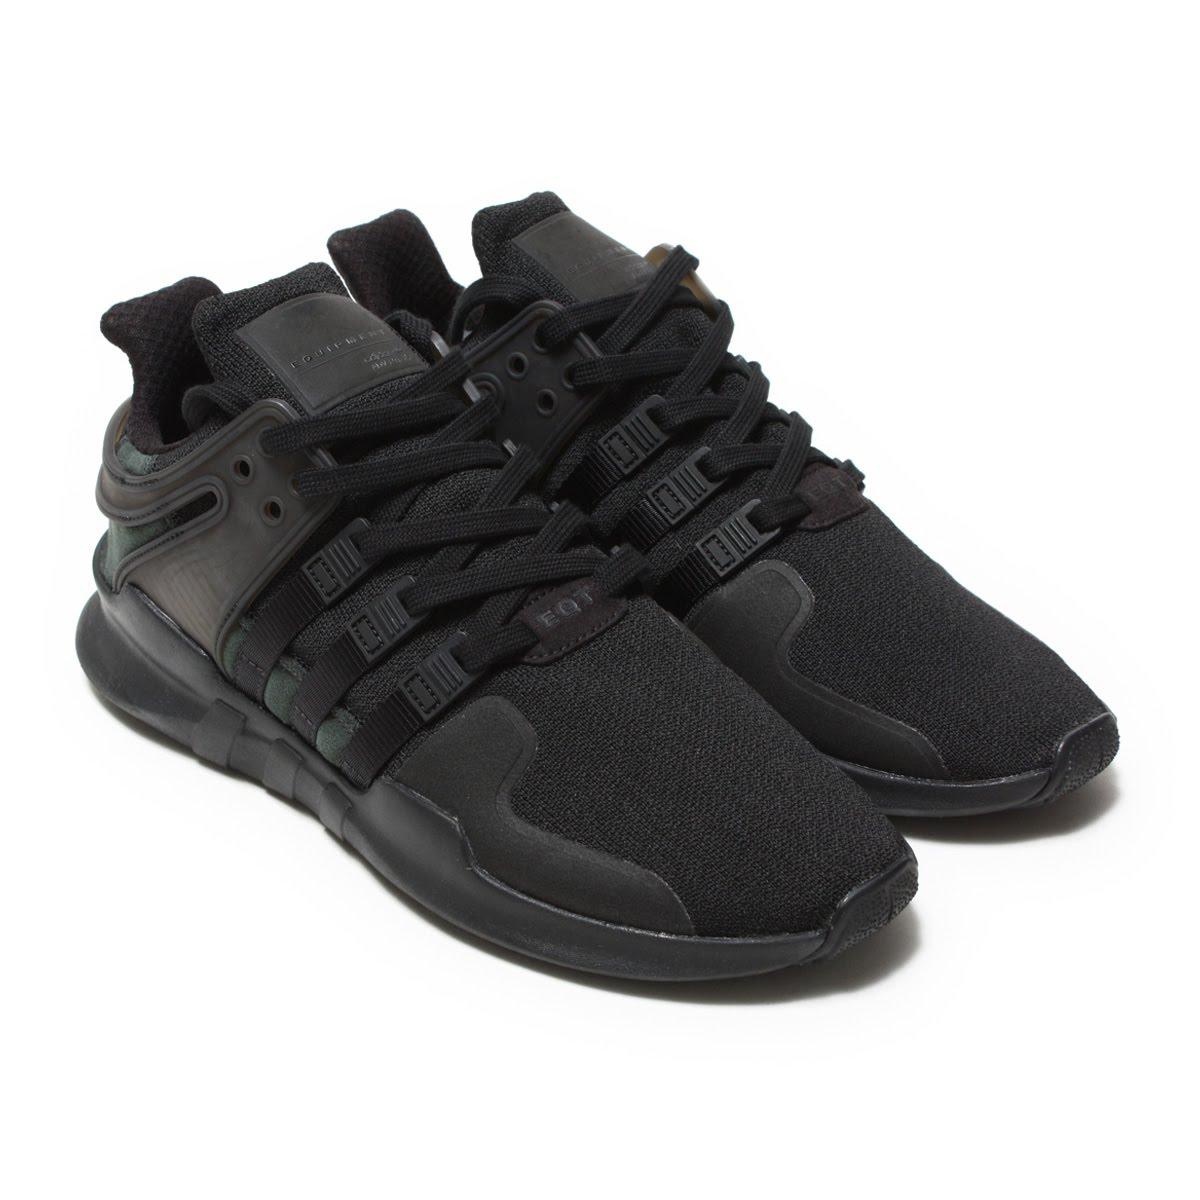 adidas Originals EQT SUPPORT ADV (アディダス オリジナルス イーキューティー サポート ADV) Core Black/Core Black/Running White【メンズ レディース スニーカー】18SS-I